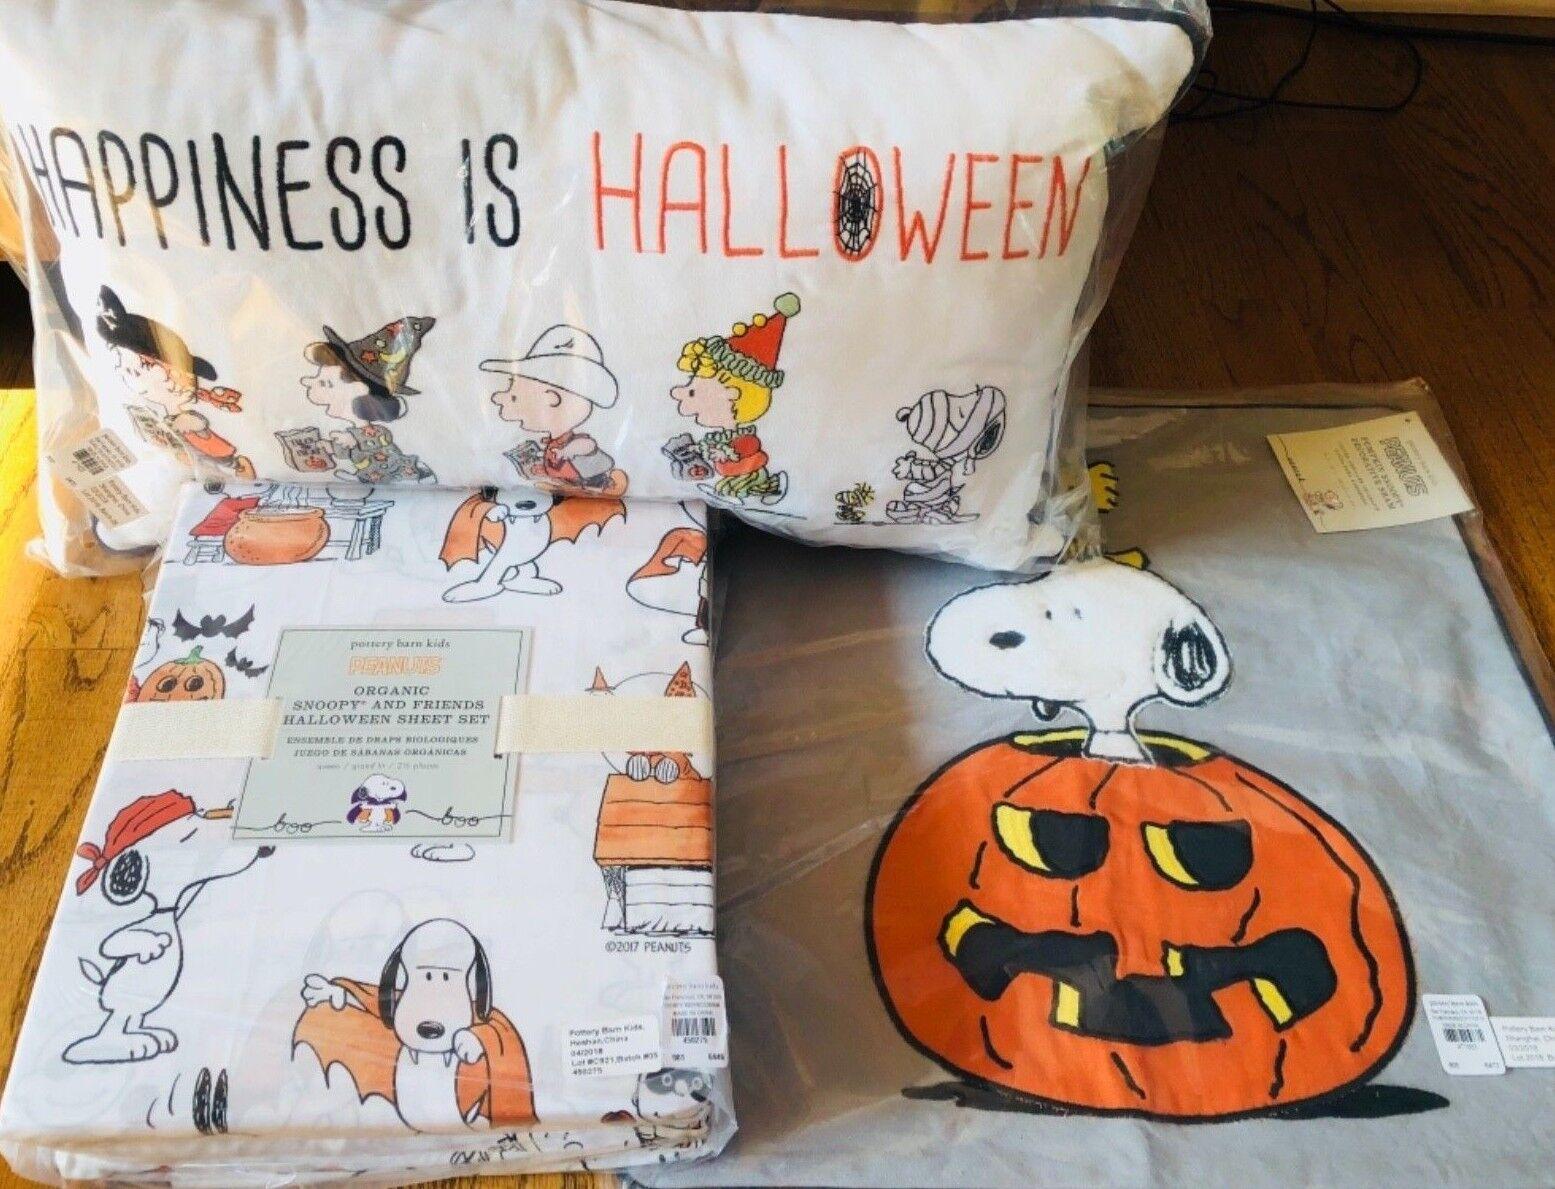 Pottery Barn Kids Peanuts Peanuts Peanuts Snoopy Sheet Set Full Happiness Is Halloween Pillow a28a02